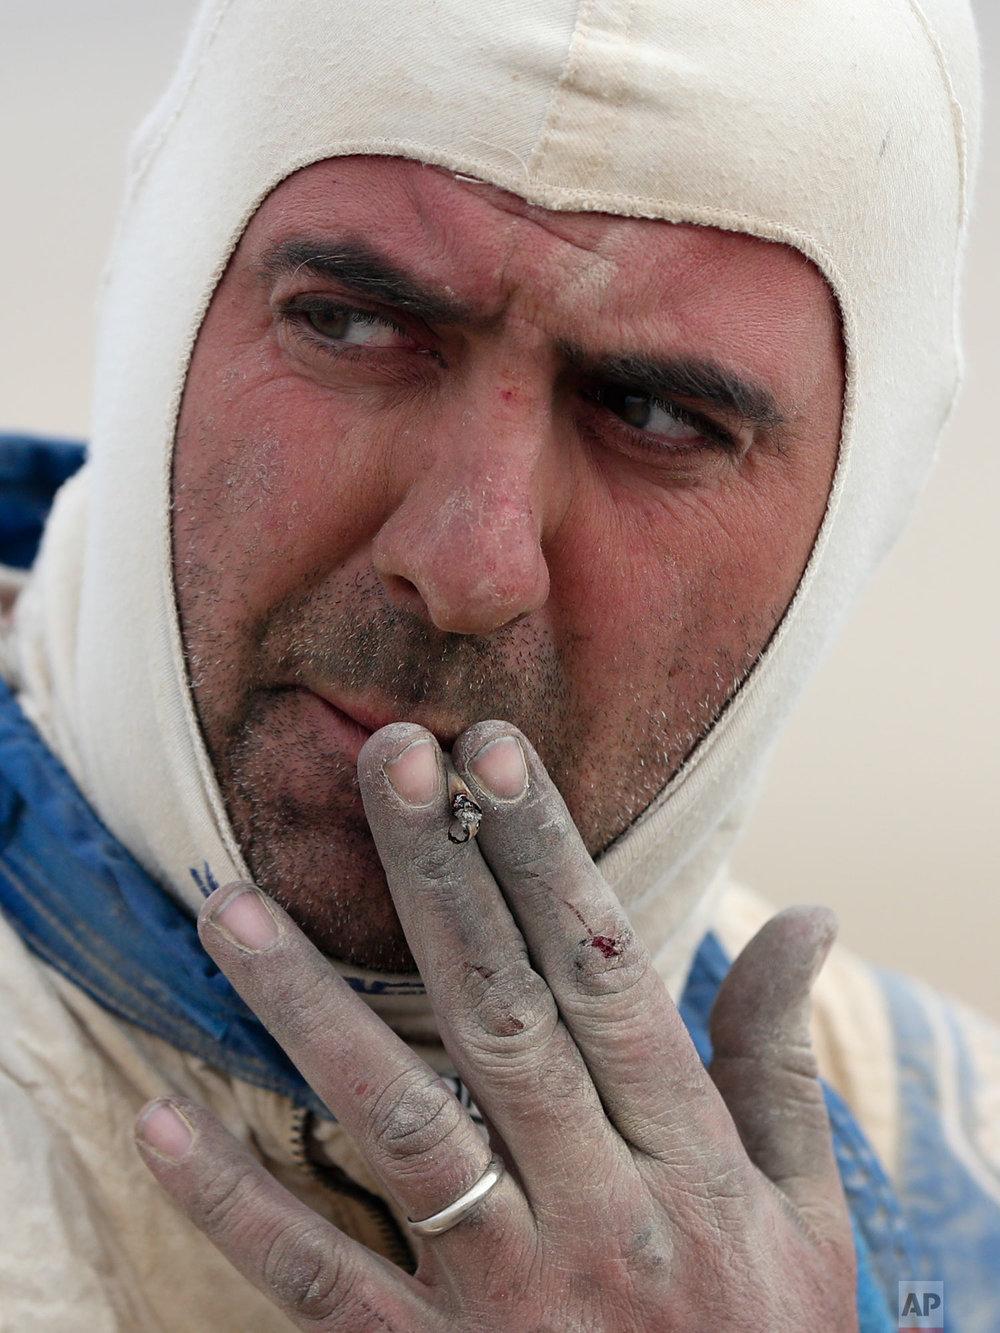 Italian co-driver Angelo Montico smokes as he competes in stage eight of the Dakar Rally, between San Juan de Marcona and Pisco, Peru, Jan. 15, 2019. (AP Photo/Ricardo Mazalan)